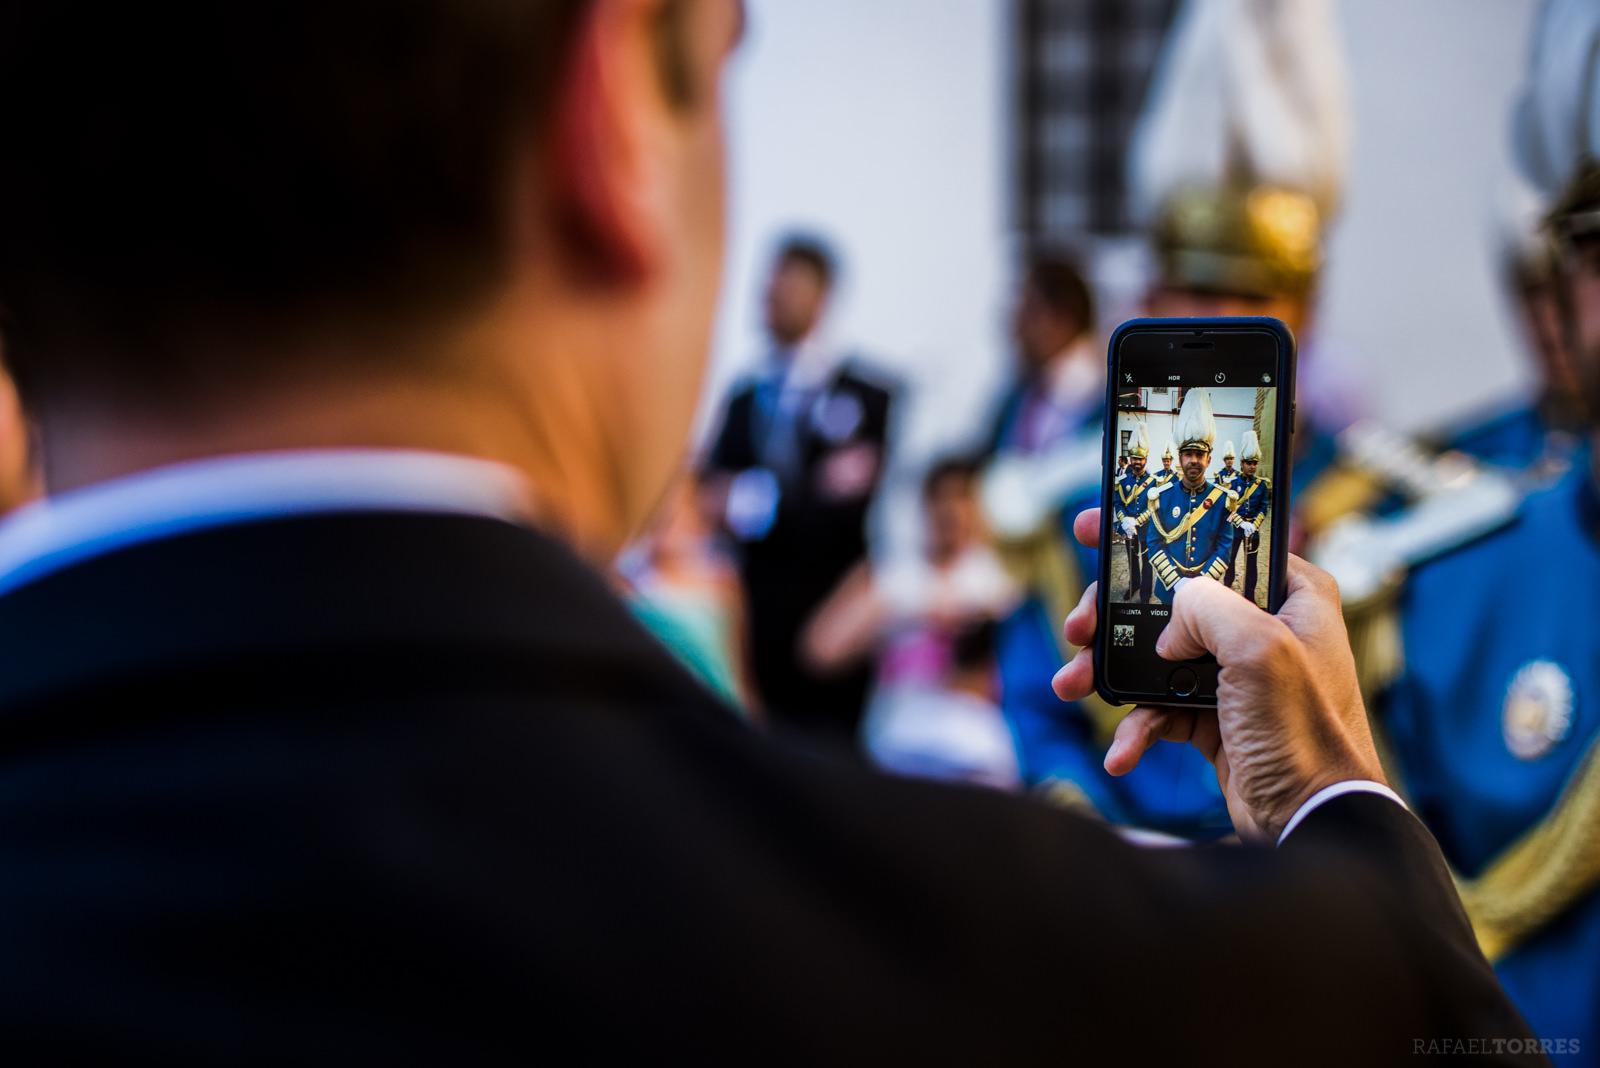 Rafael+Torres+fotografo+bodas+sevilla+madrid+barcelona+wedding+photographer+bodas+diferentes+bodaensevilla+molinillos+fotografo+hacienda+oran+alfonso+wedding+photographer-7.jpg